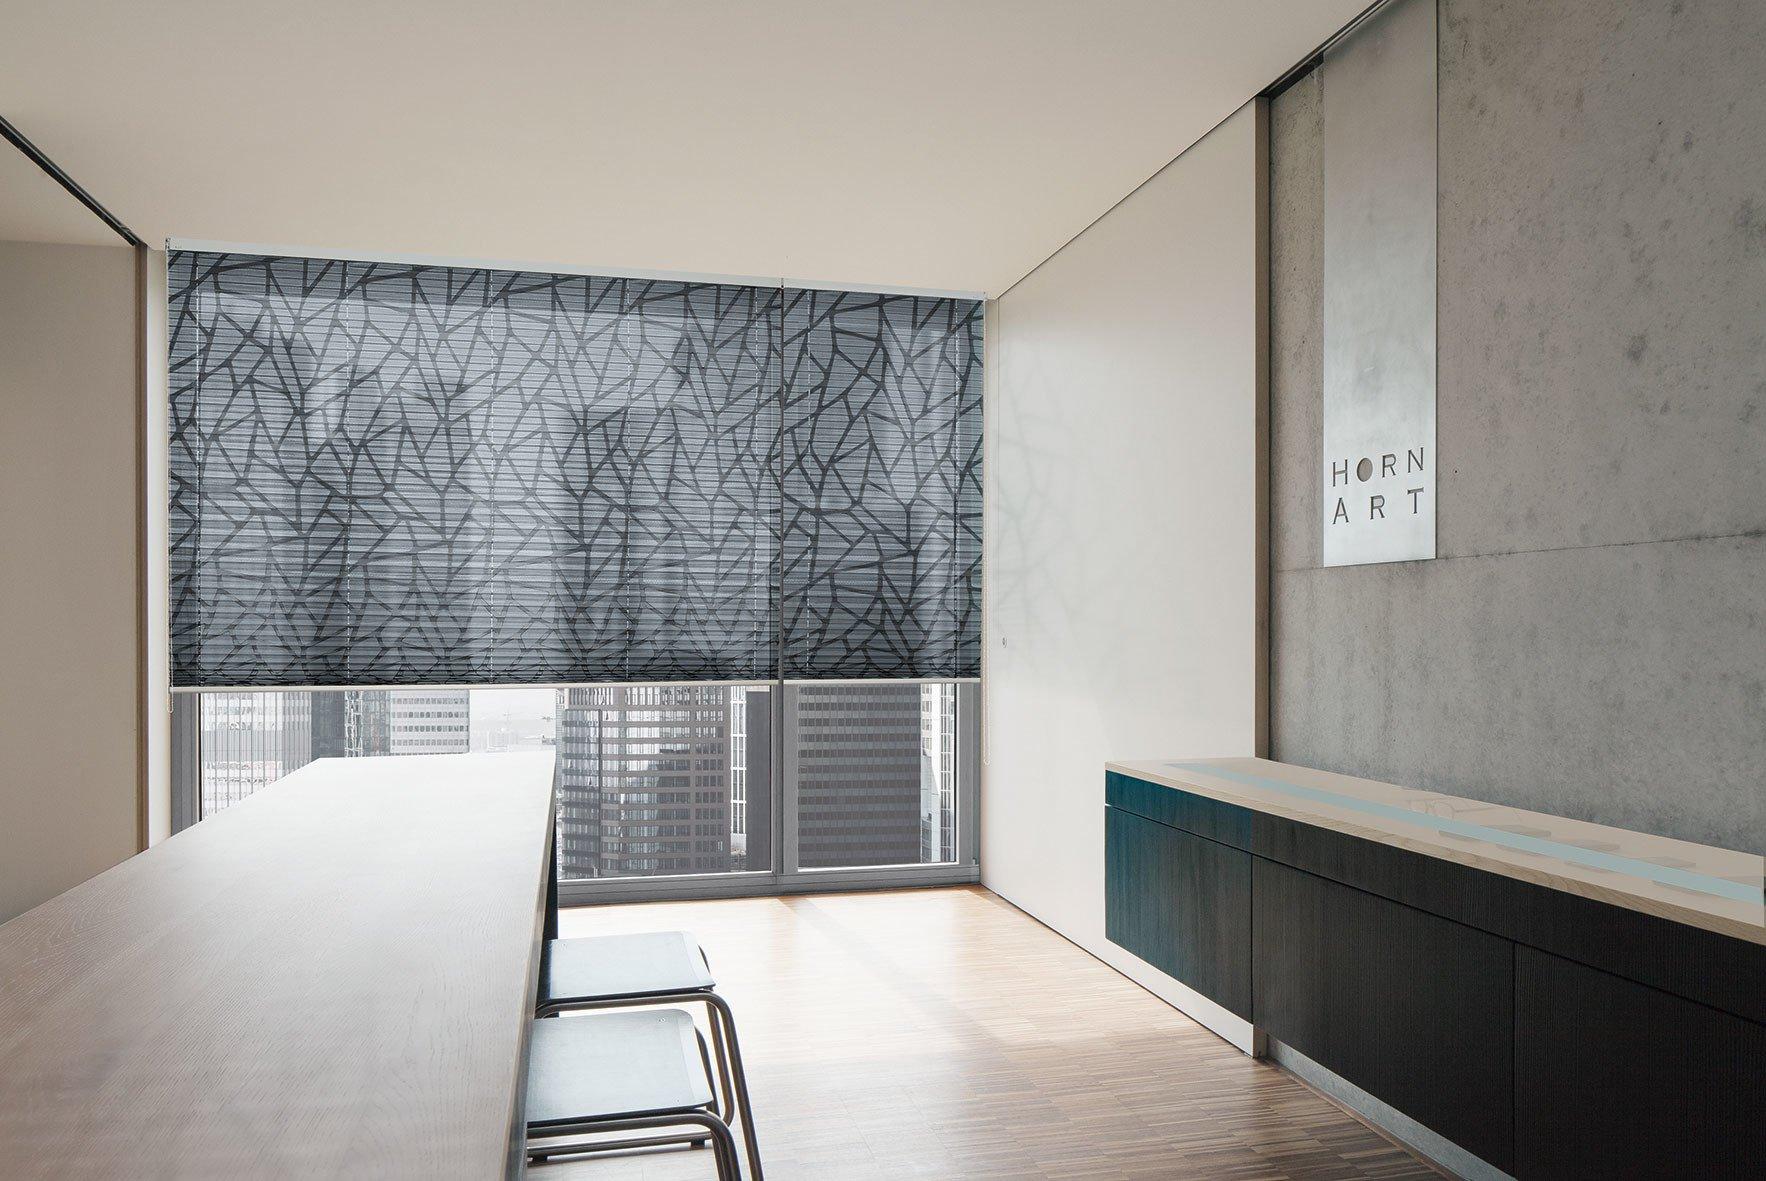 faltstore sonnenschutz textilien baunetz wissen. Black Bedroom Furniture Sets. Home Design Ideas